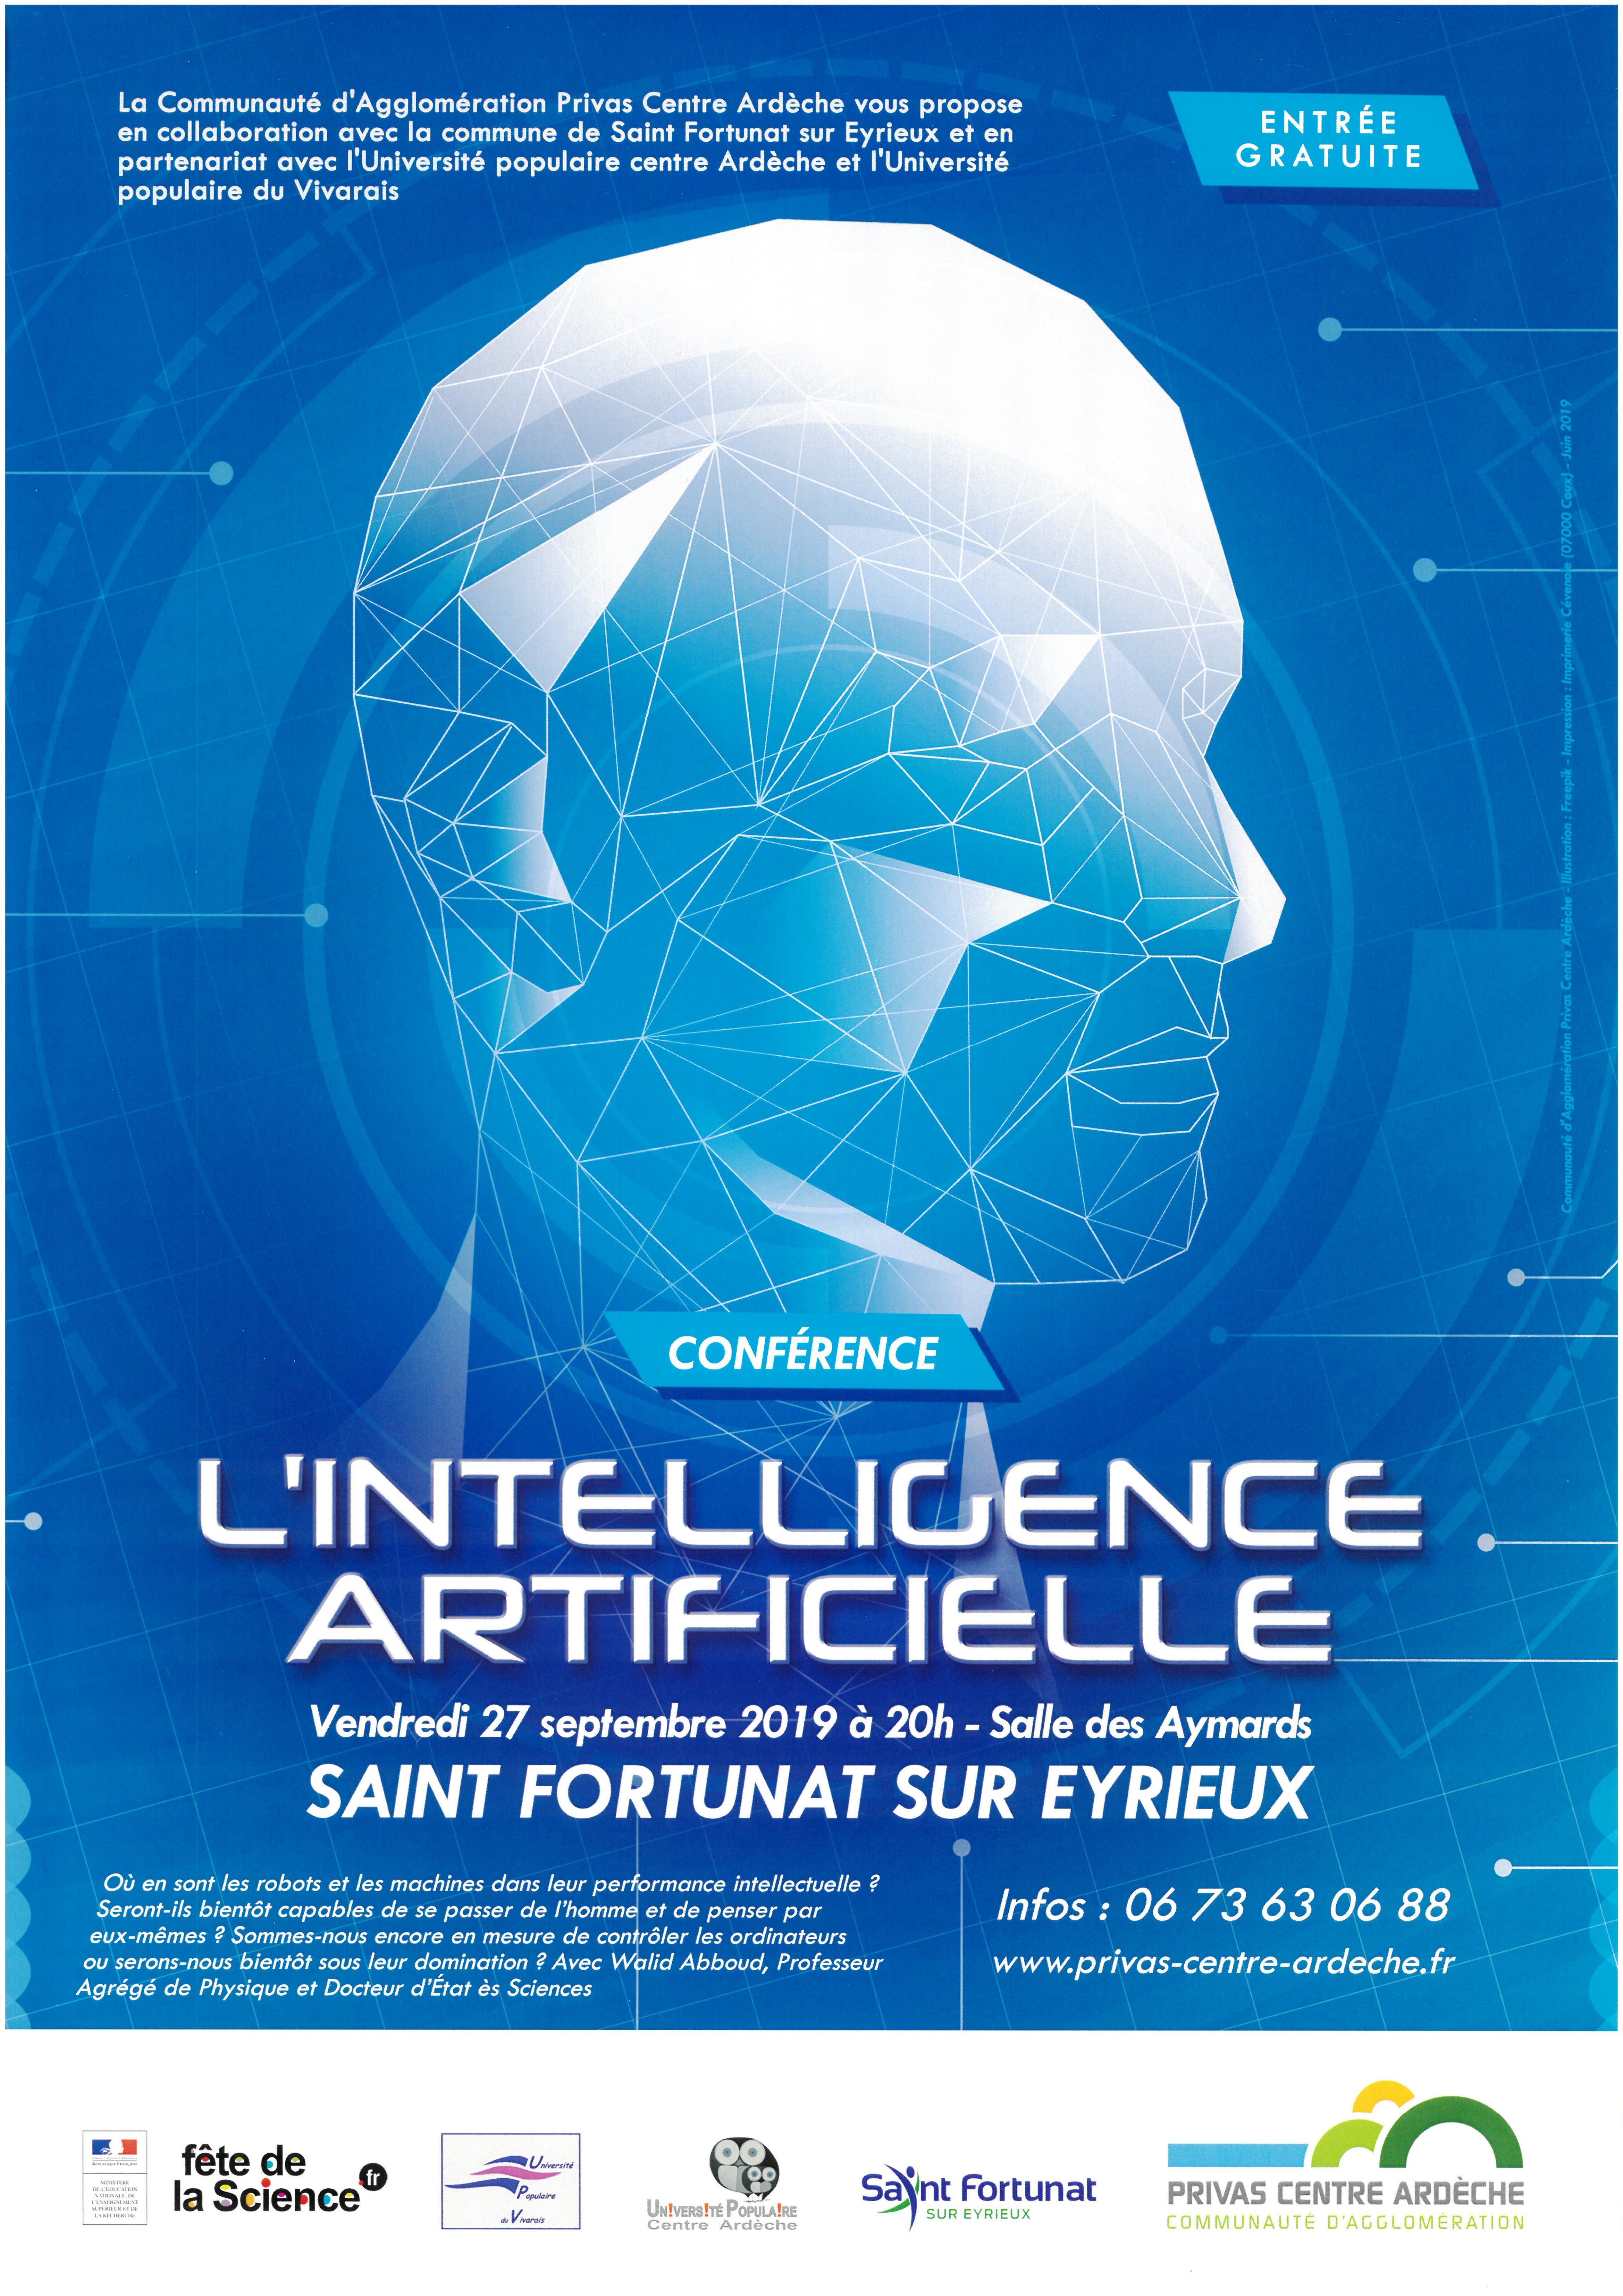 Alle leuke evenementen! : Fête de la science : conférence L'intelligence artificielle